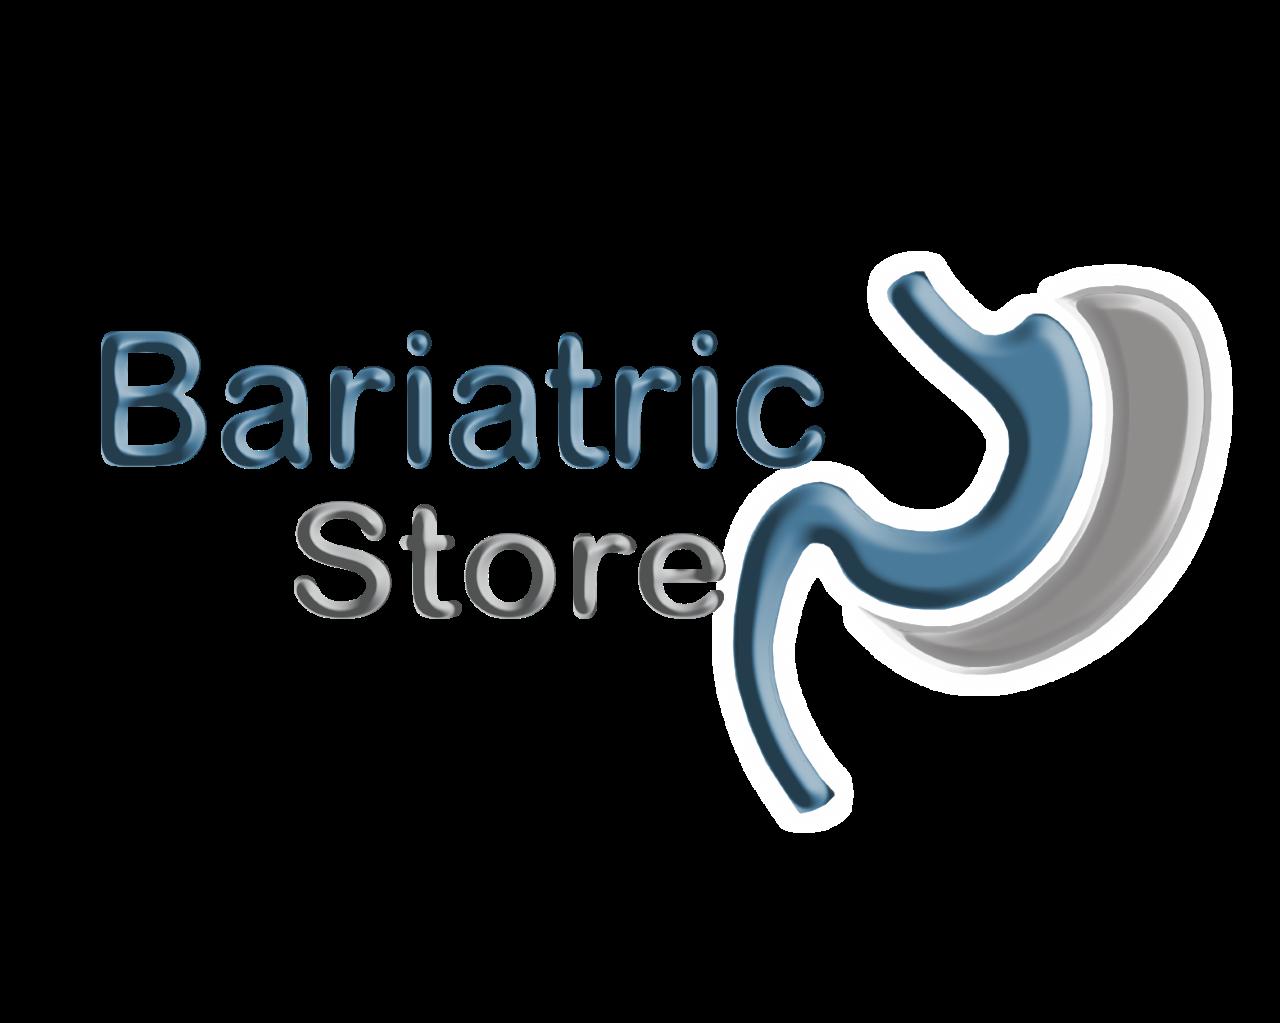 Bariatric Store